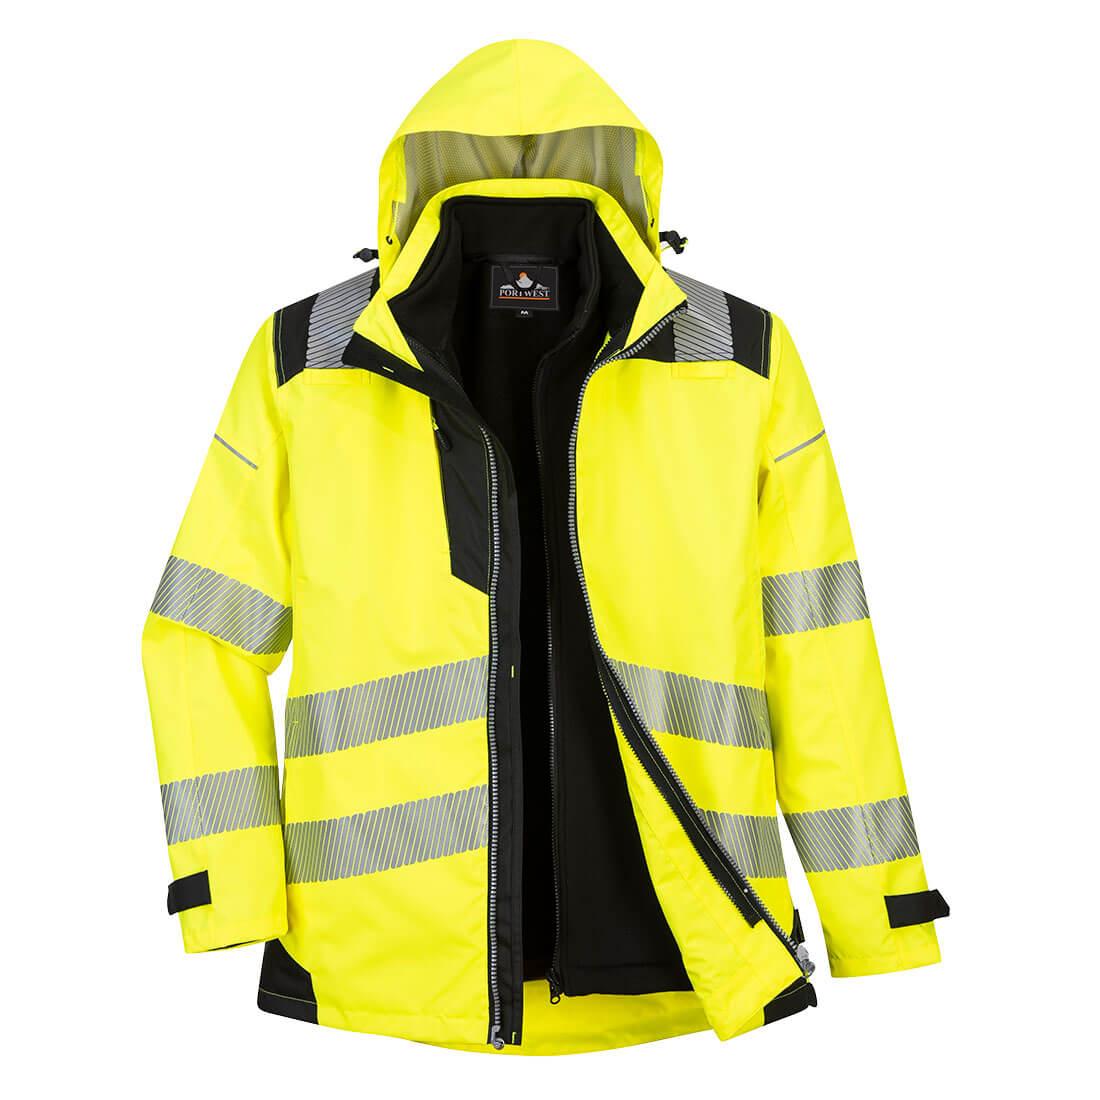 Warnschutz 3-in-1 Jacke Klasse 3